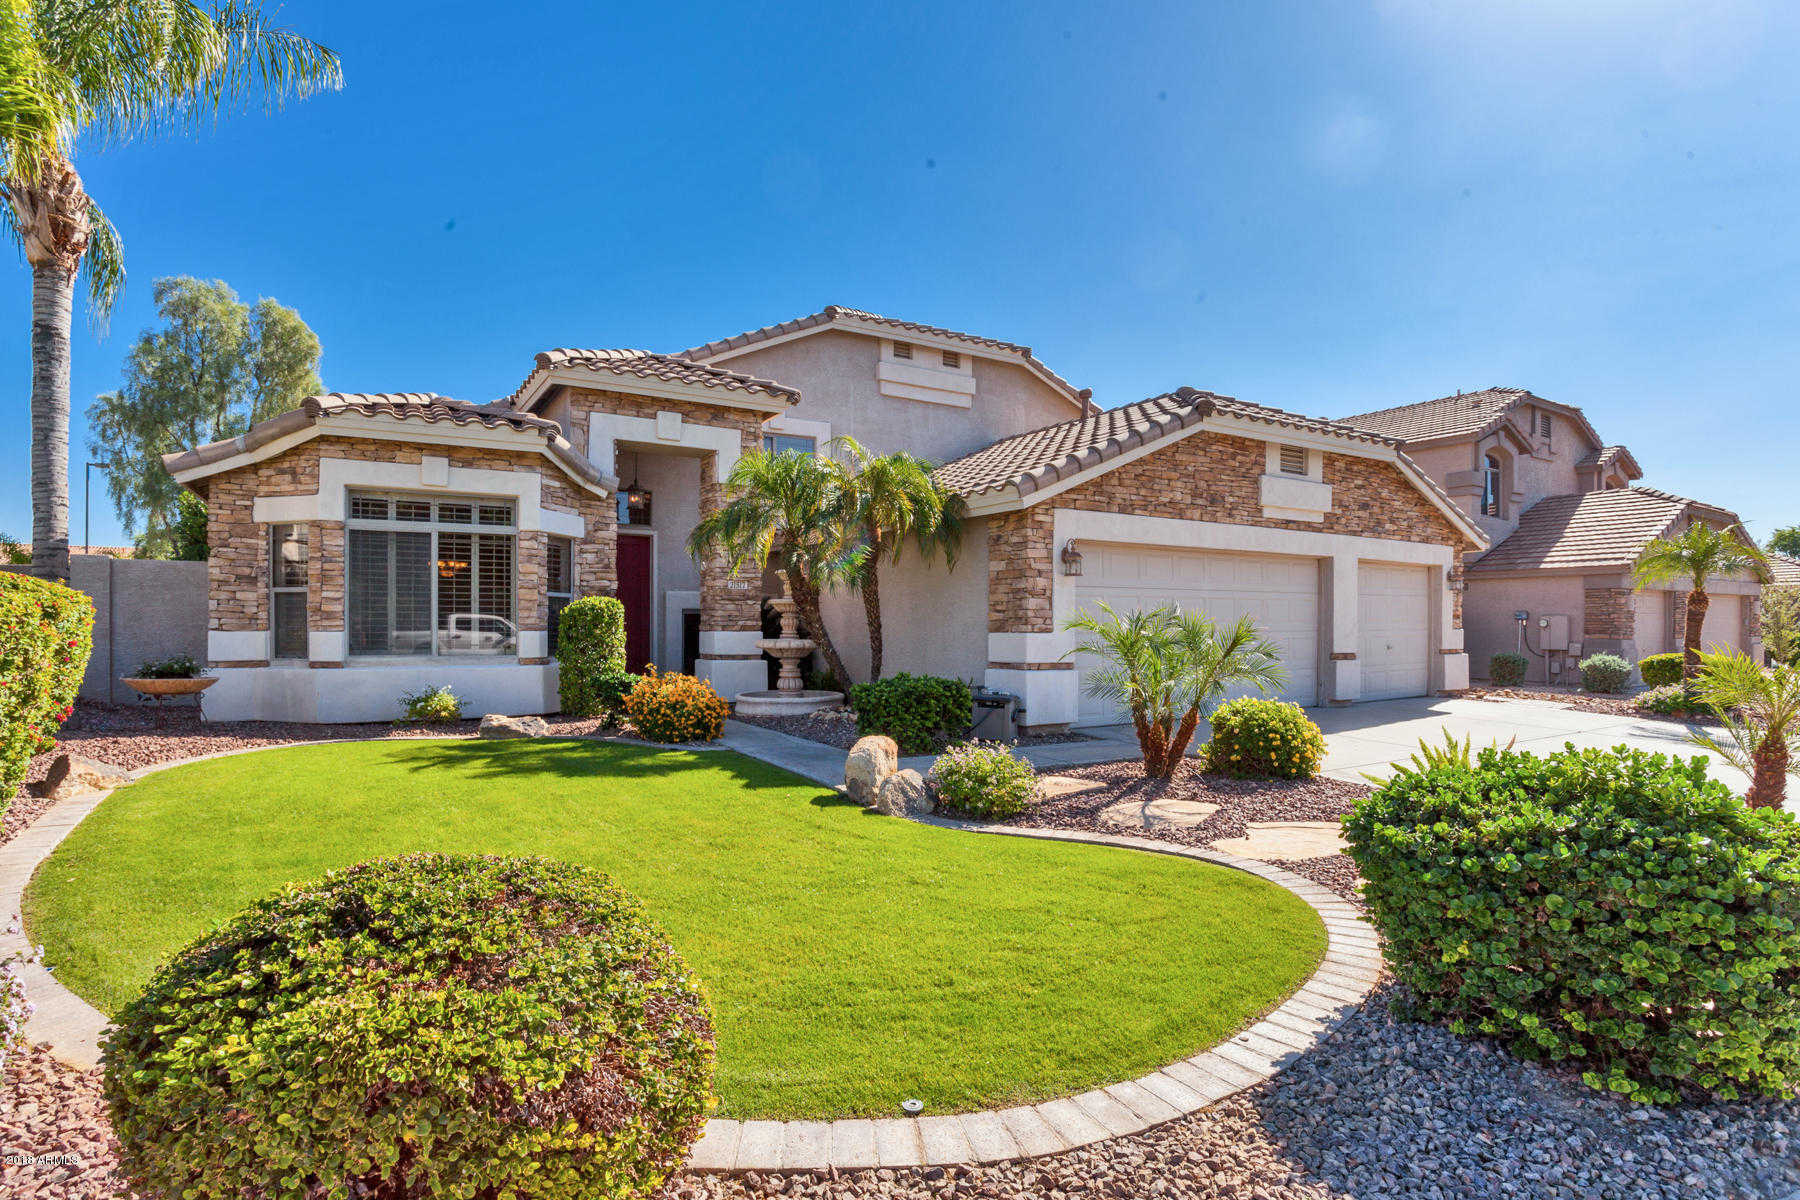 $485,000 - 5Br/3Ba - Home for Sale in Diamante Vista, Glendale